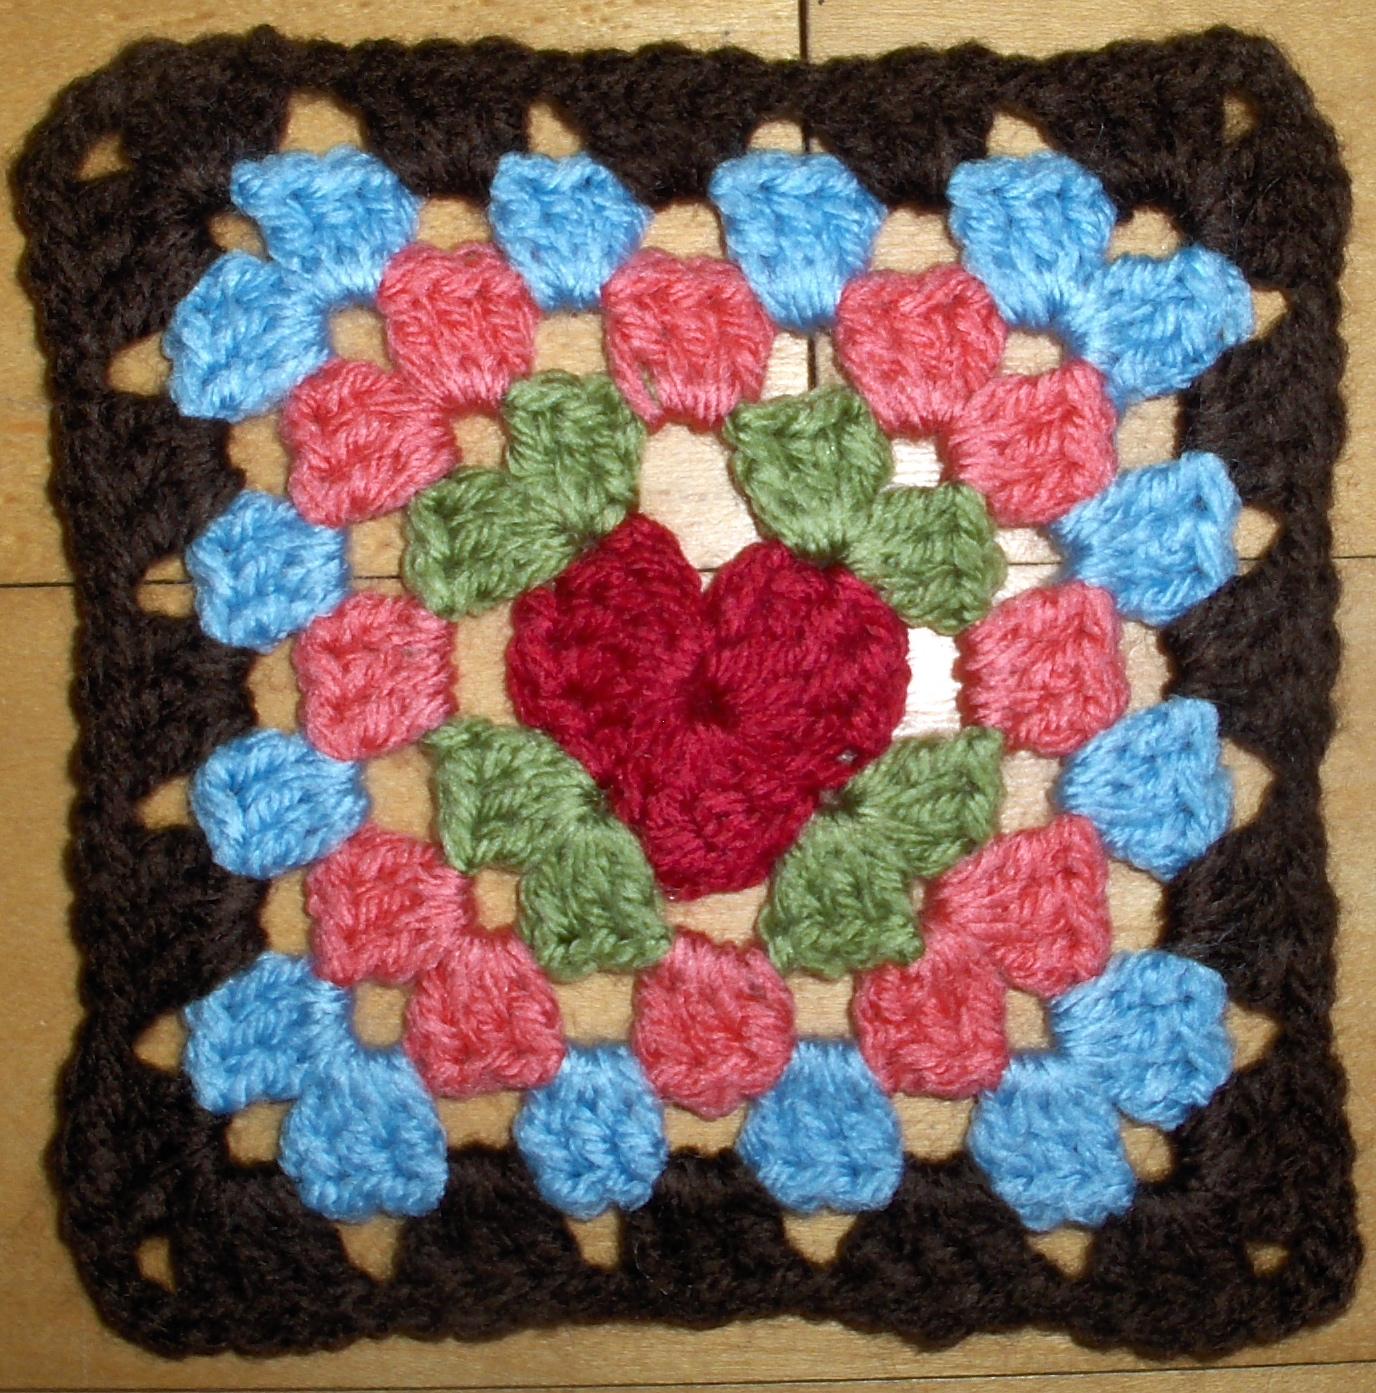 Da\'s Crochet Connection: July 2013